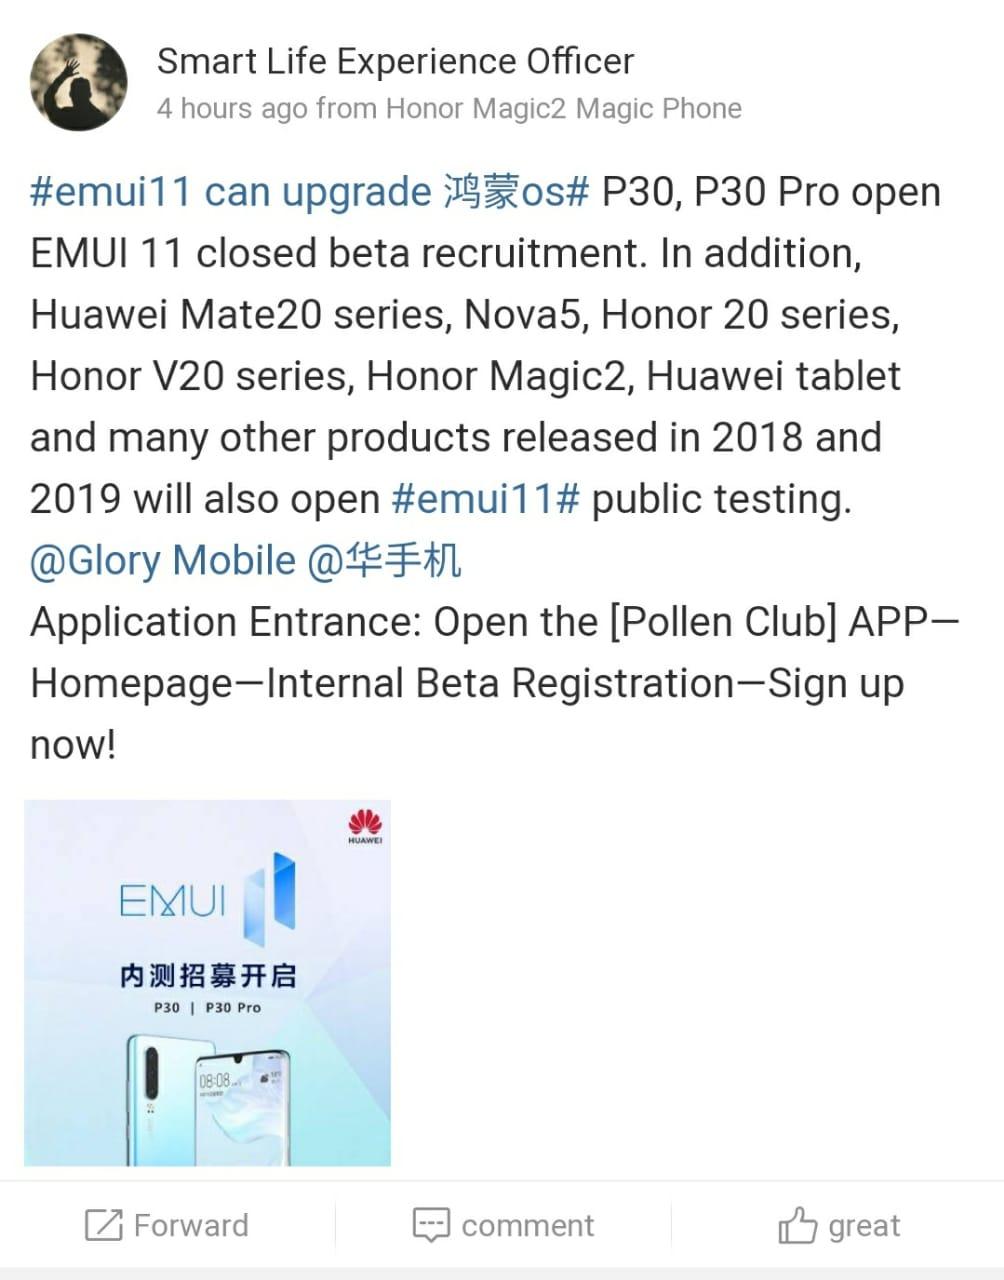 Huawei EMUI11